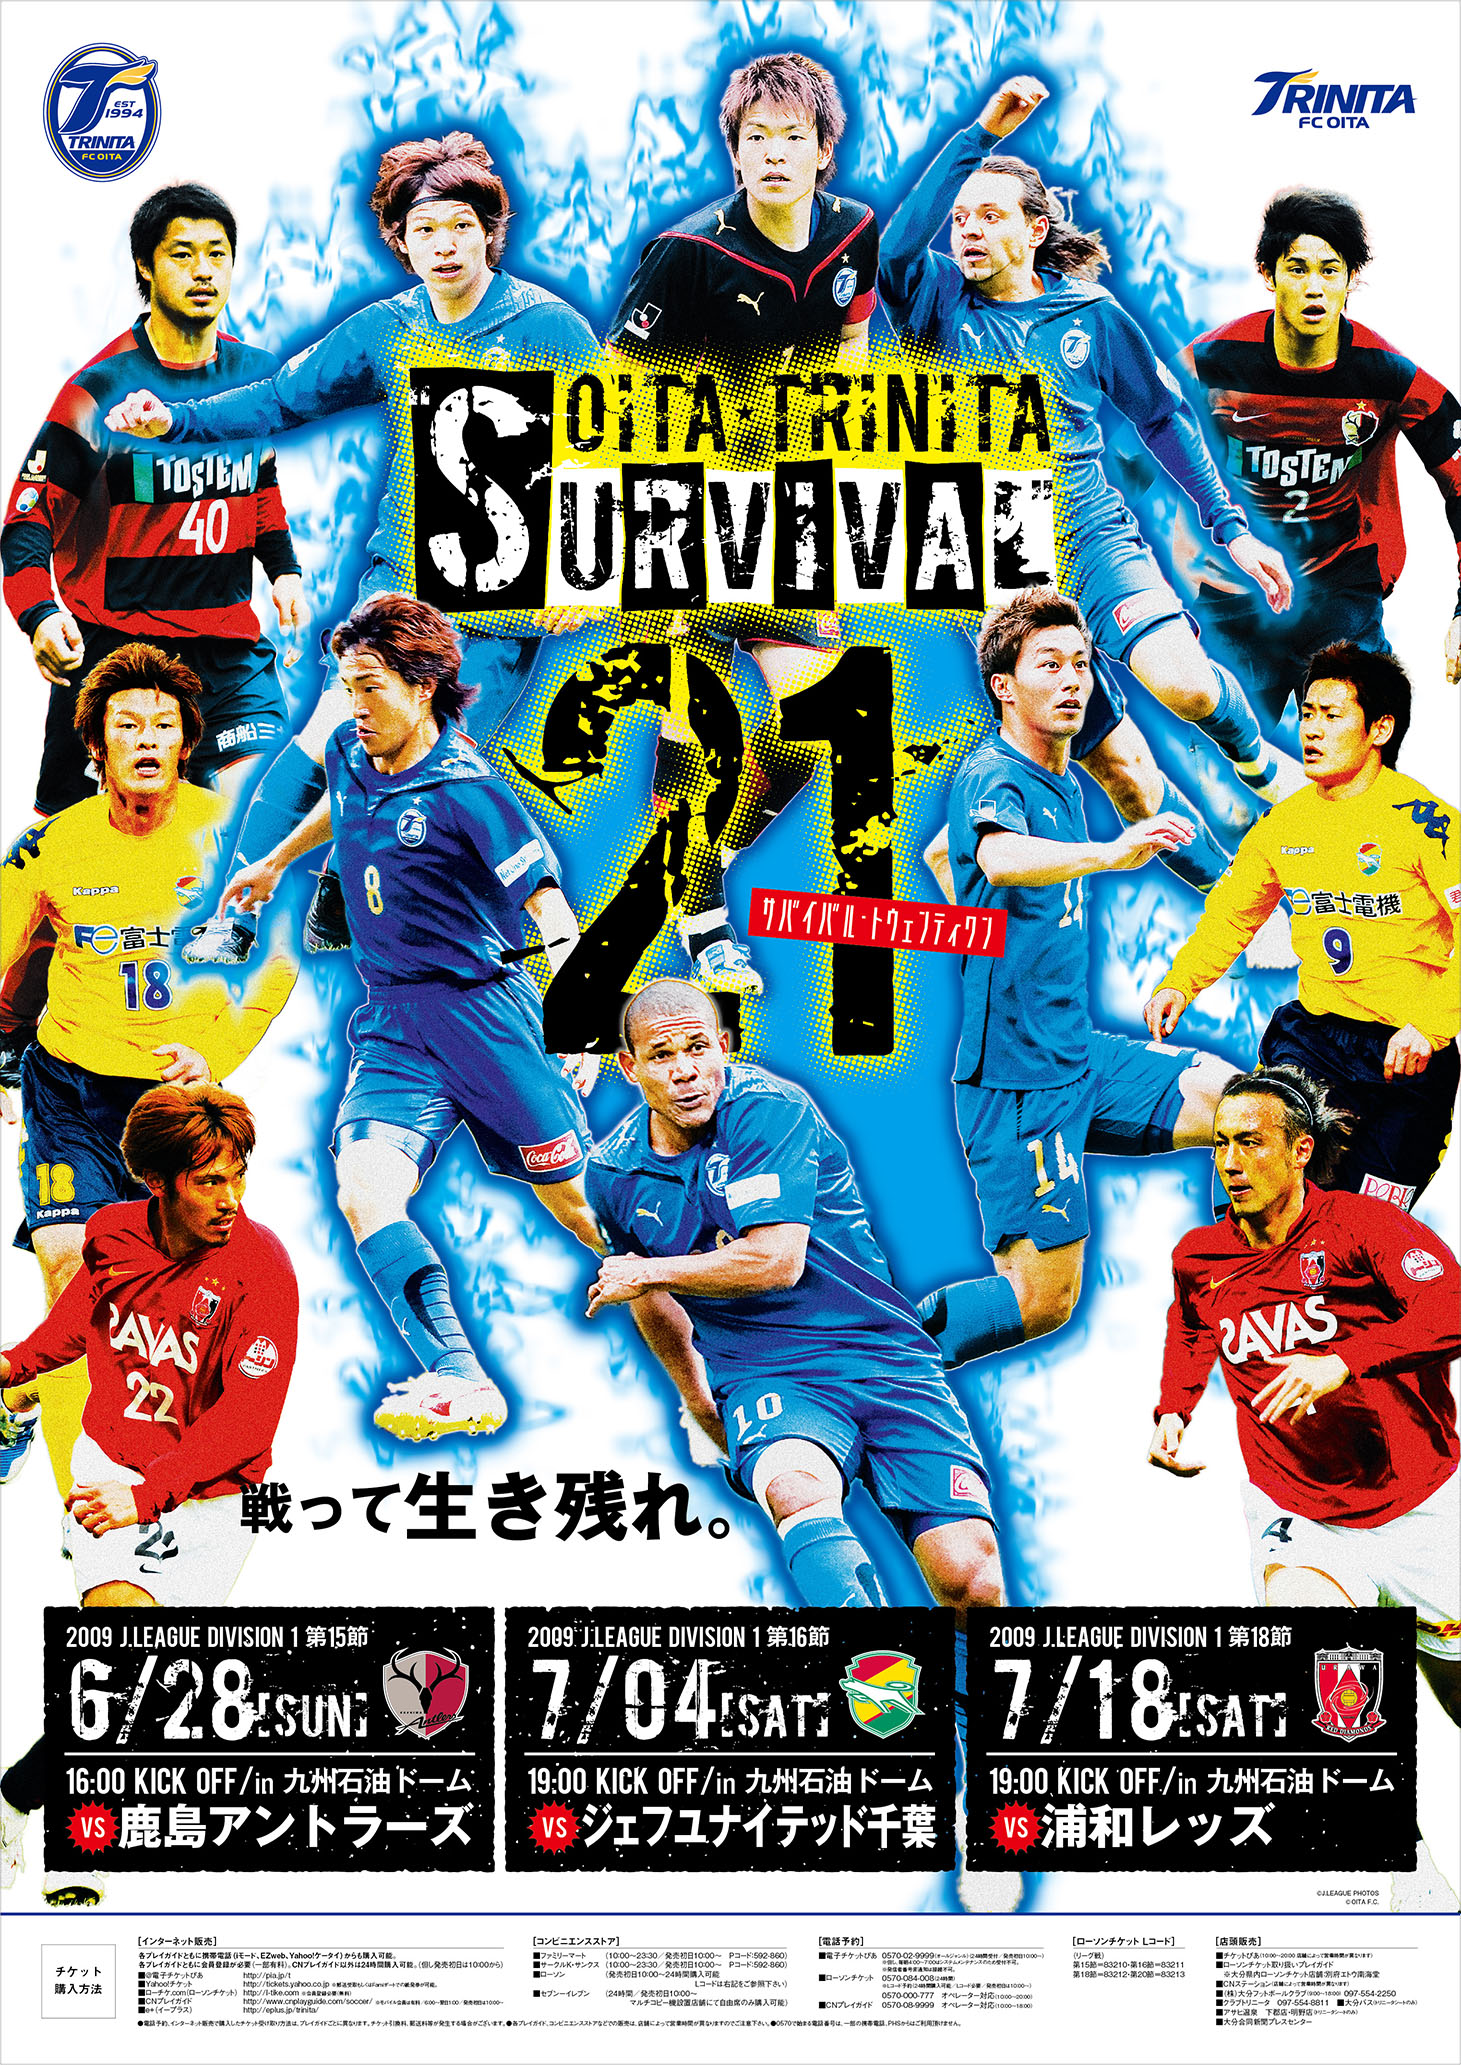 OITA TRINITA 2009 SURVIVAL21 ポスター